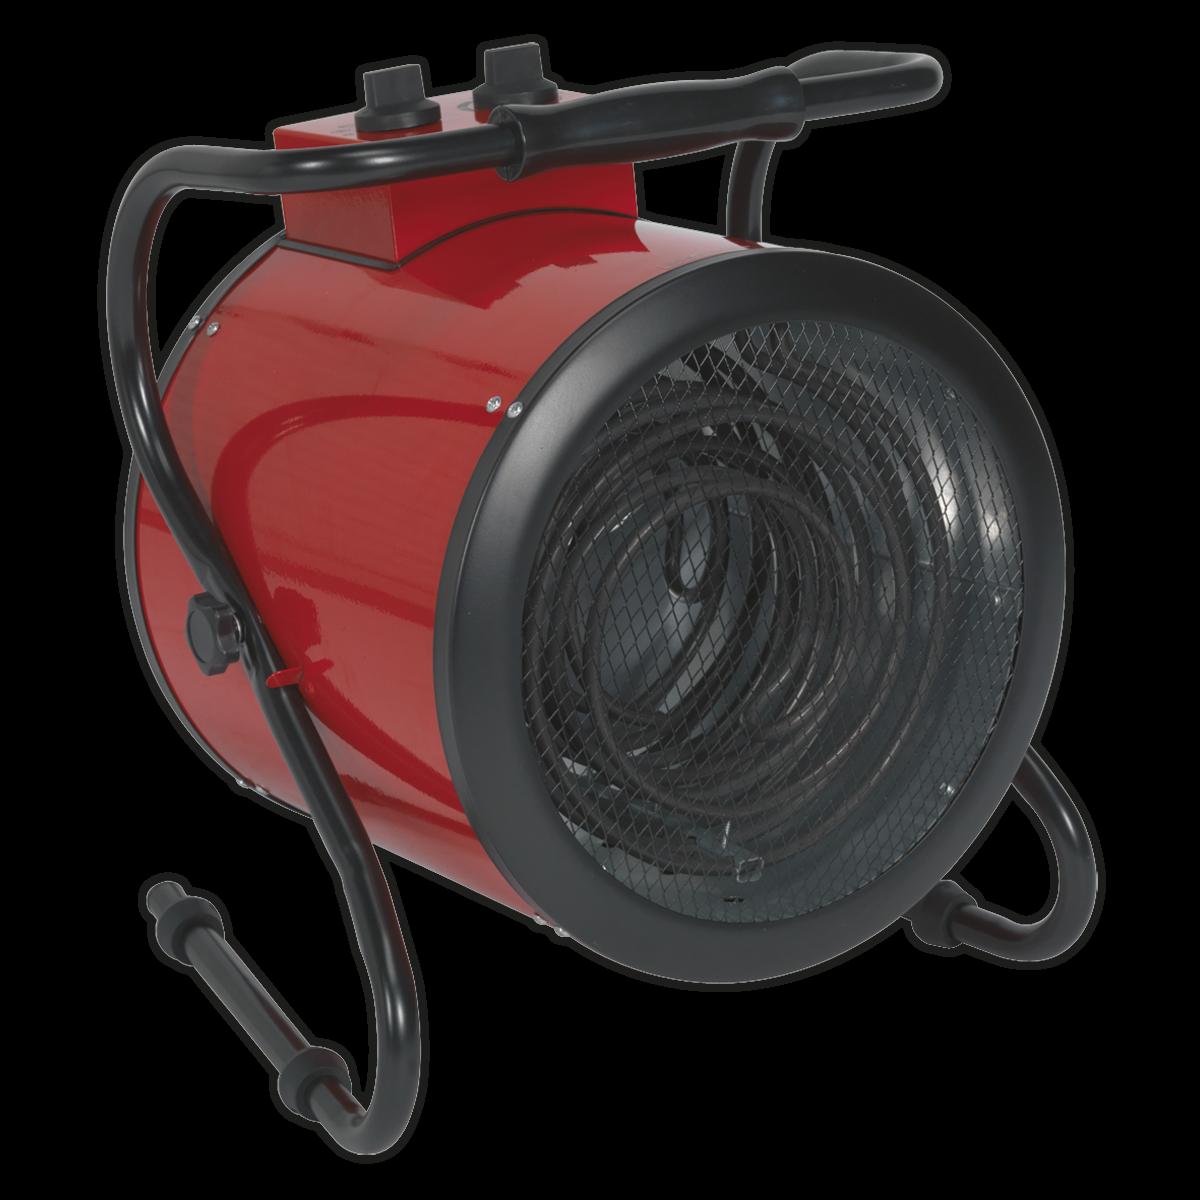 - Industrial Fan Heater 9kW 415V 3ph SEALEY EH9001 by Sealey